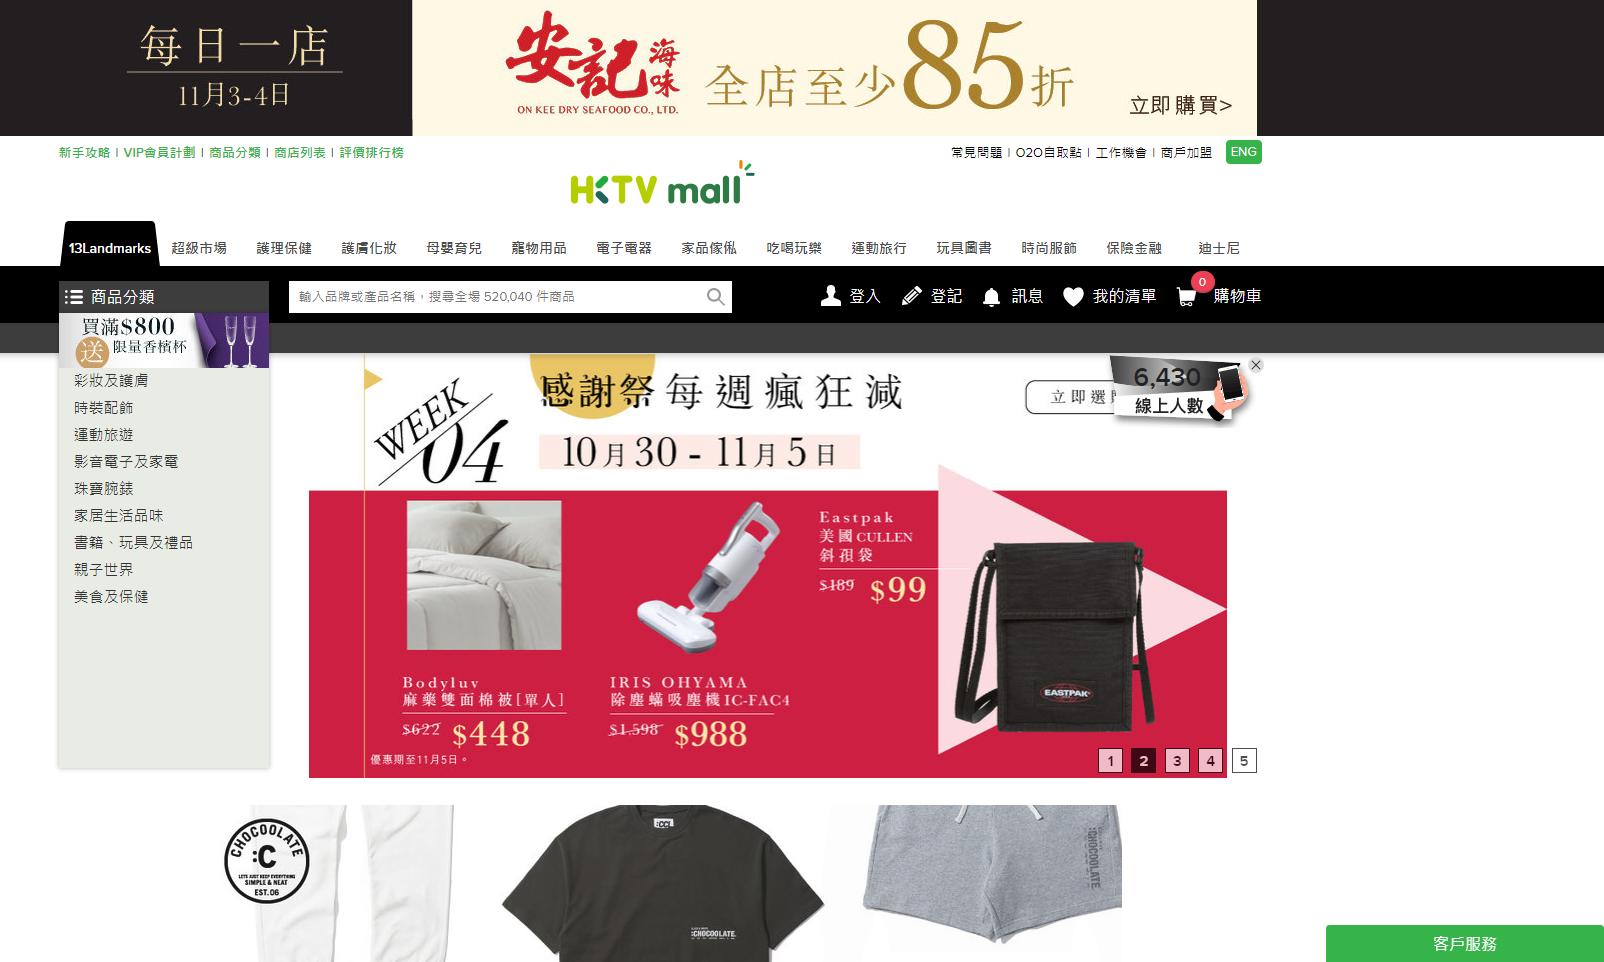 【Amazon開店?】認識自家網店和網上商城的不同之處!- HKTVMall